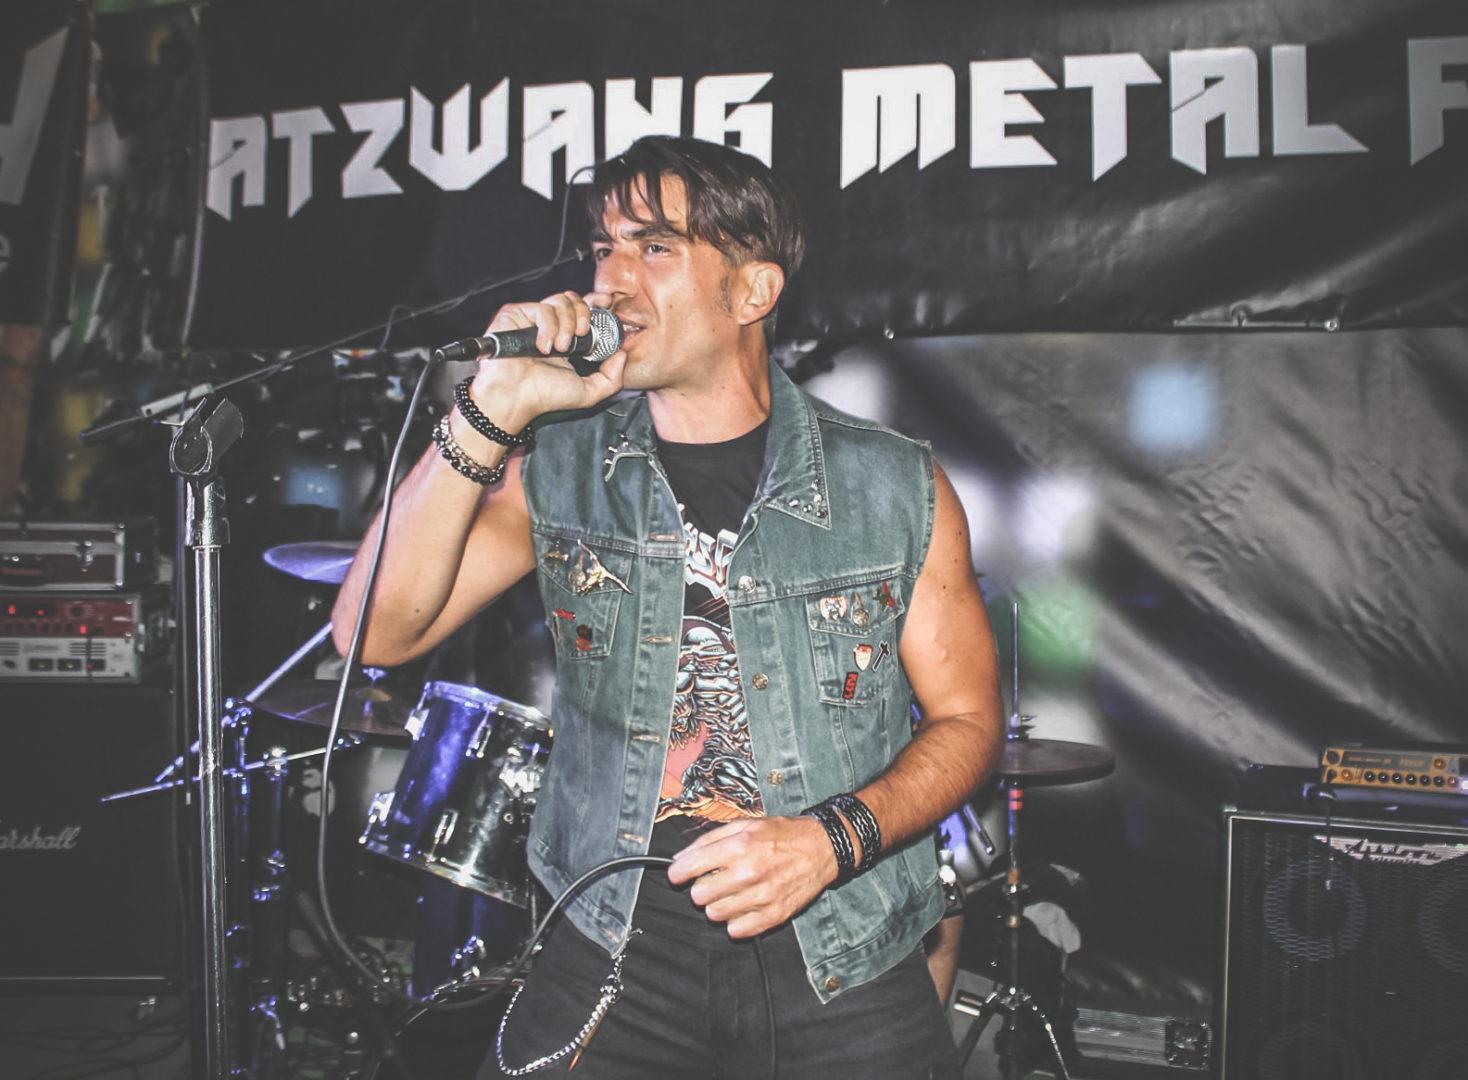 Atzwang Metal Fest 9 27